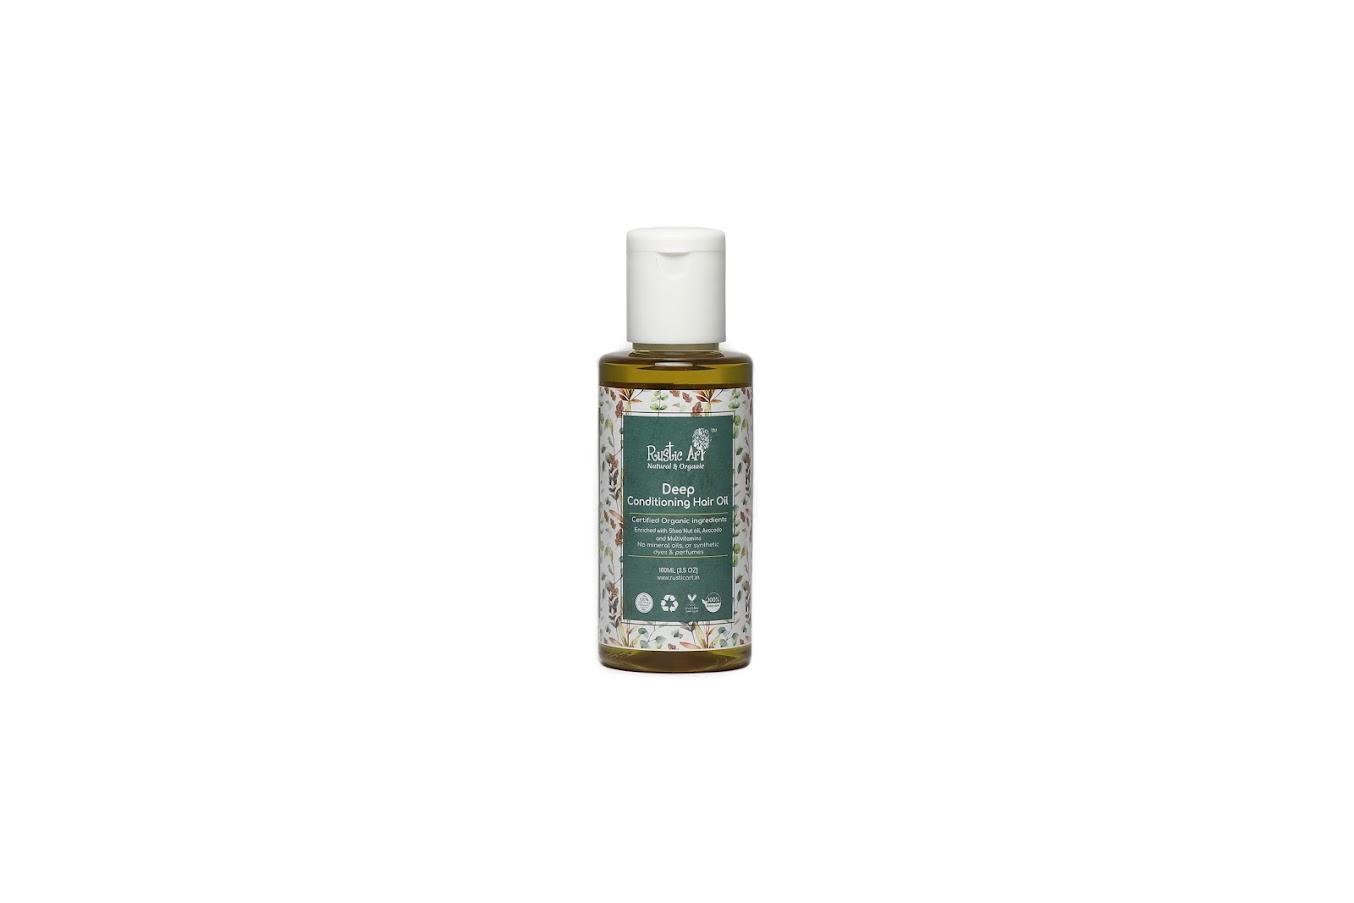 Rustic Art Organic Deep Conditioning Hair Oil